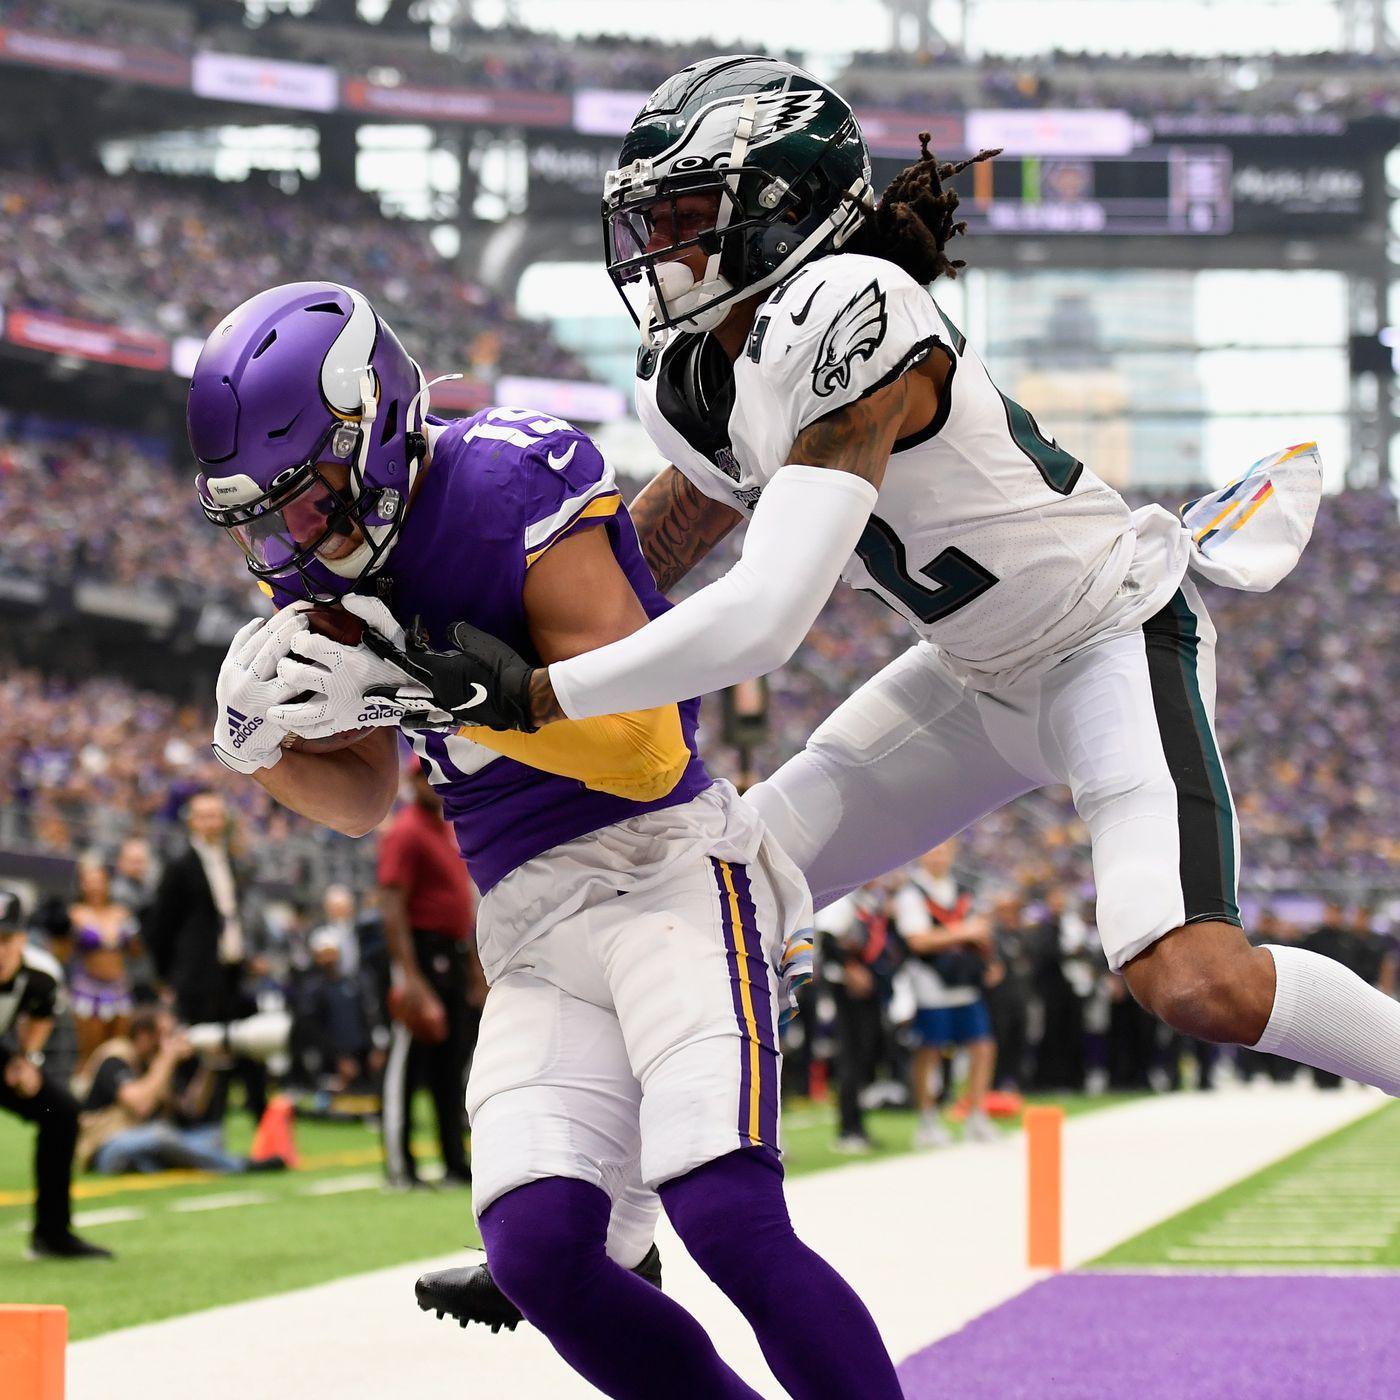 Eagles Vs Vikings Final Score Philadelphia S Secondary Struggles In Loss To Minnesota 38 20 Bleeding Green Nation